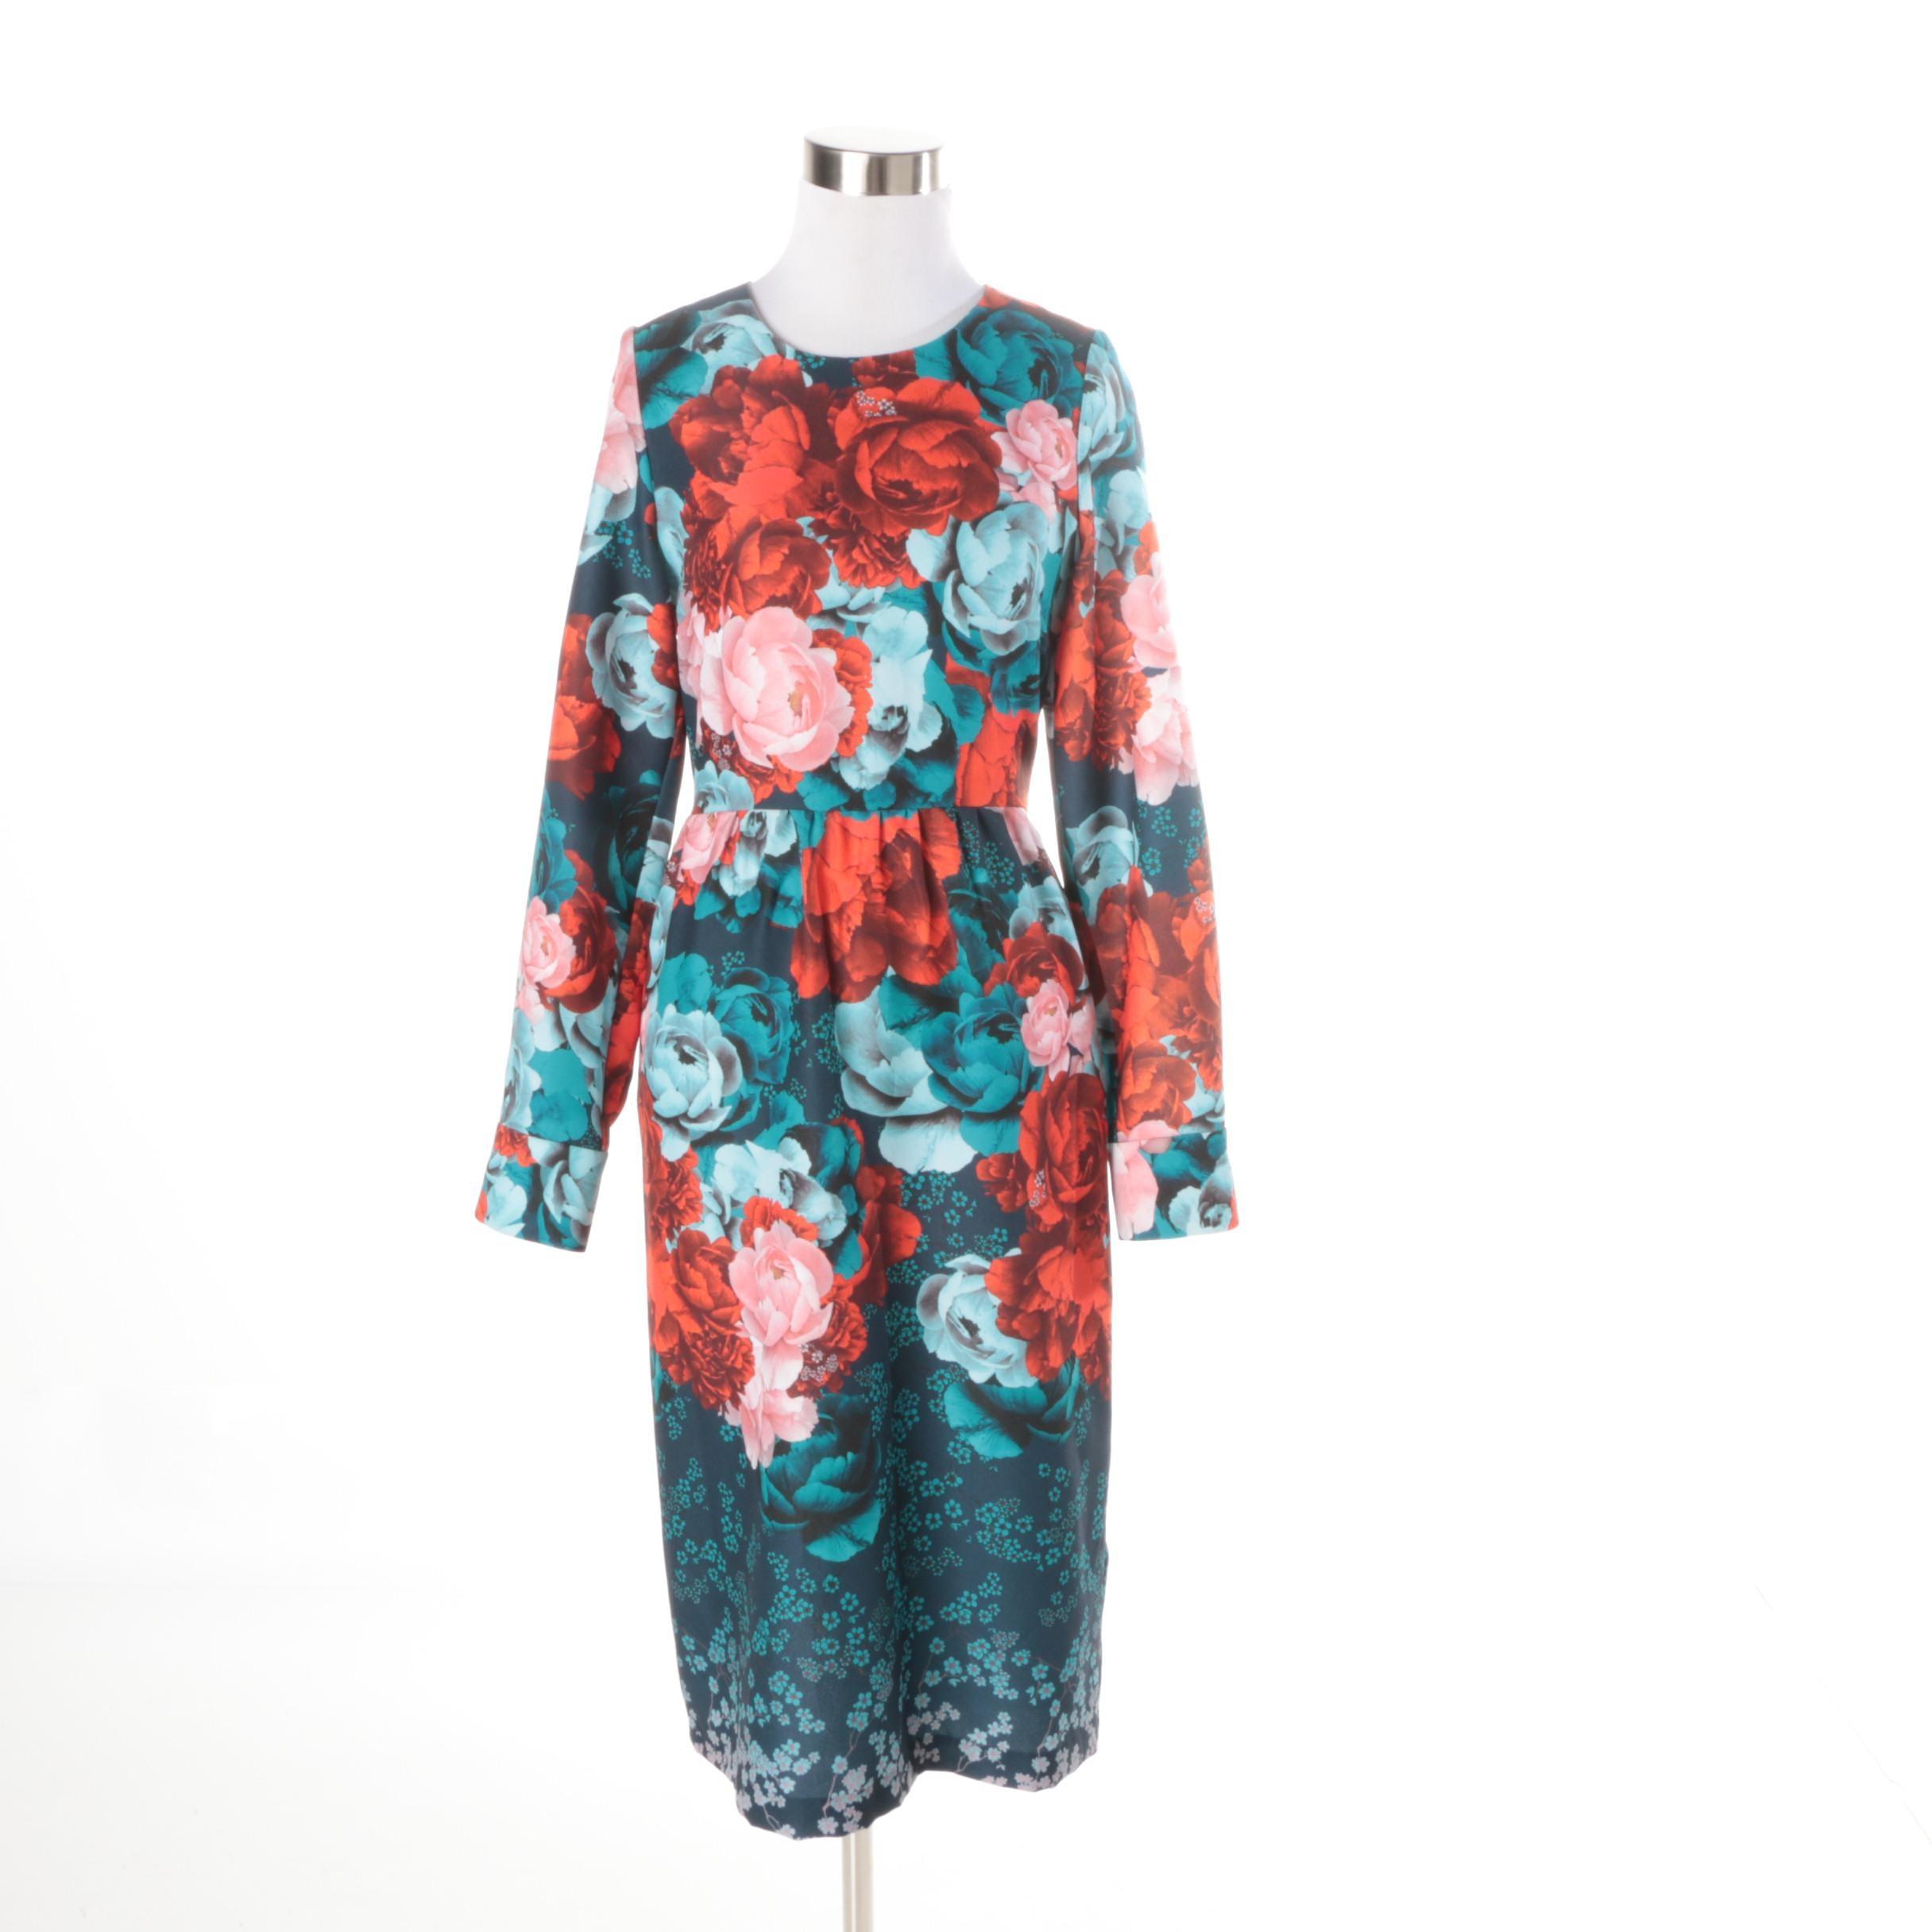 Trelise Cooper Floral Print Fit and Flare Sample Dress